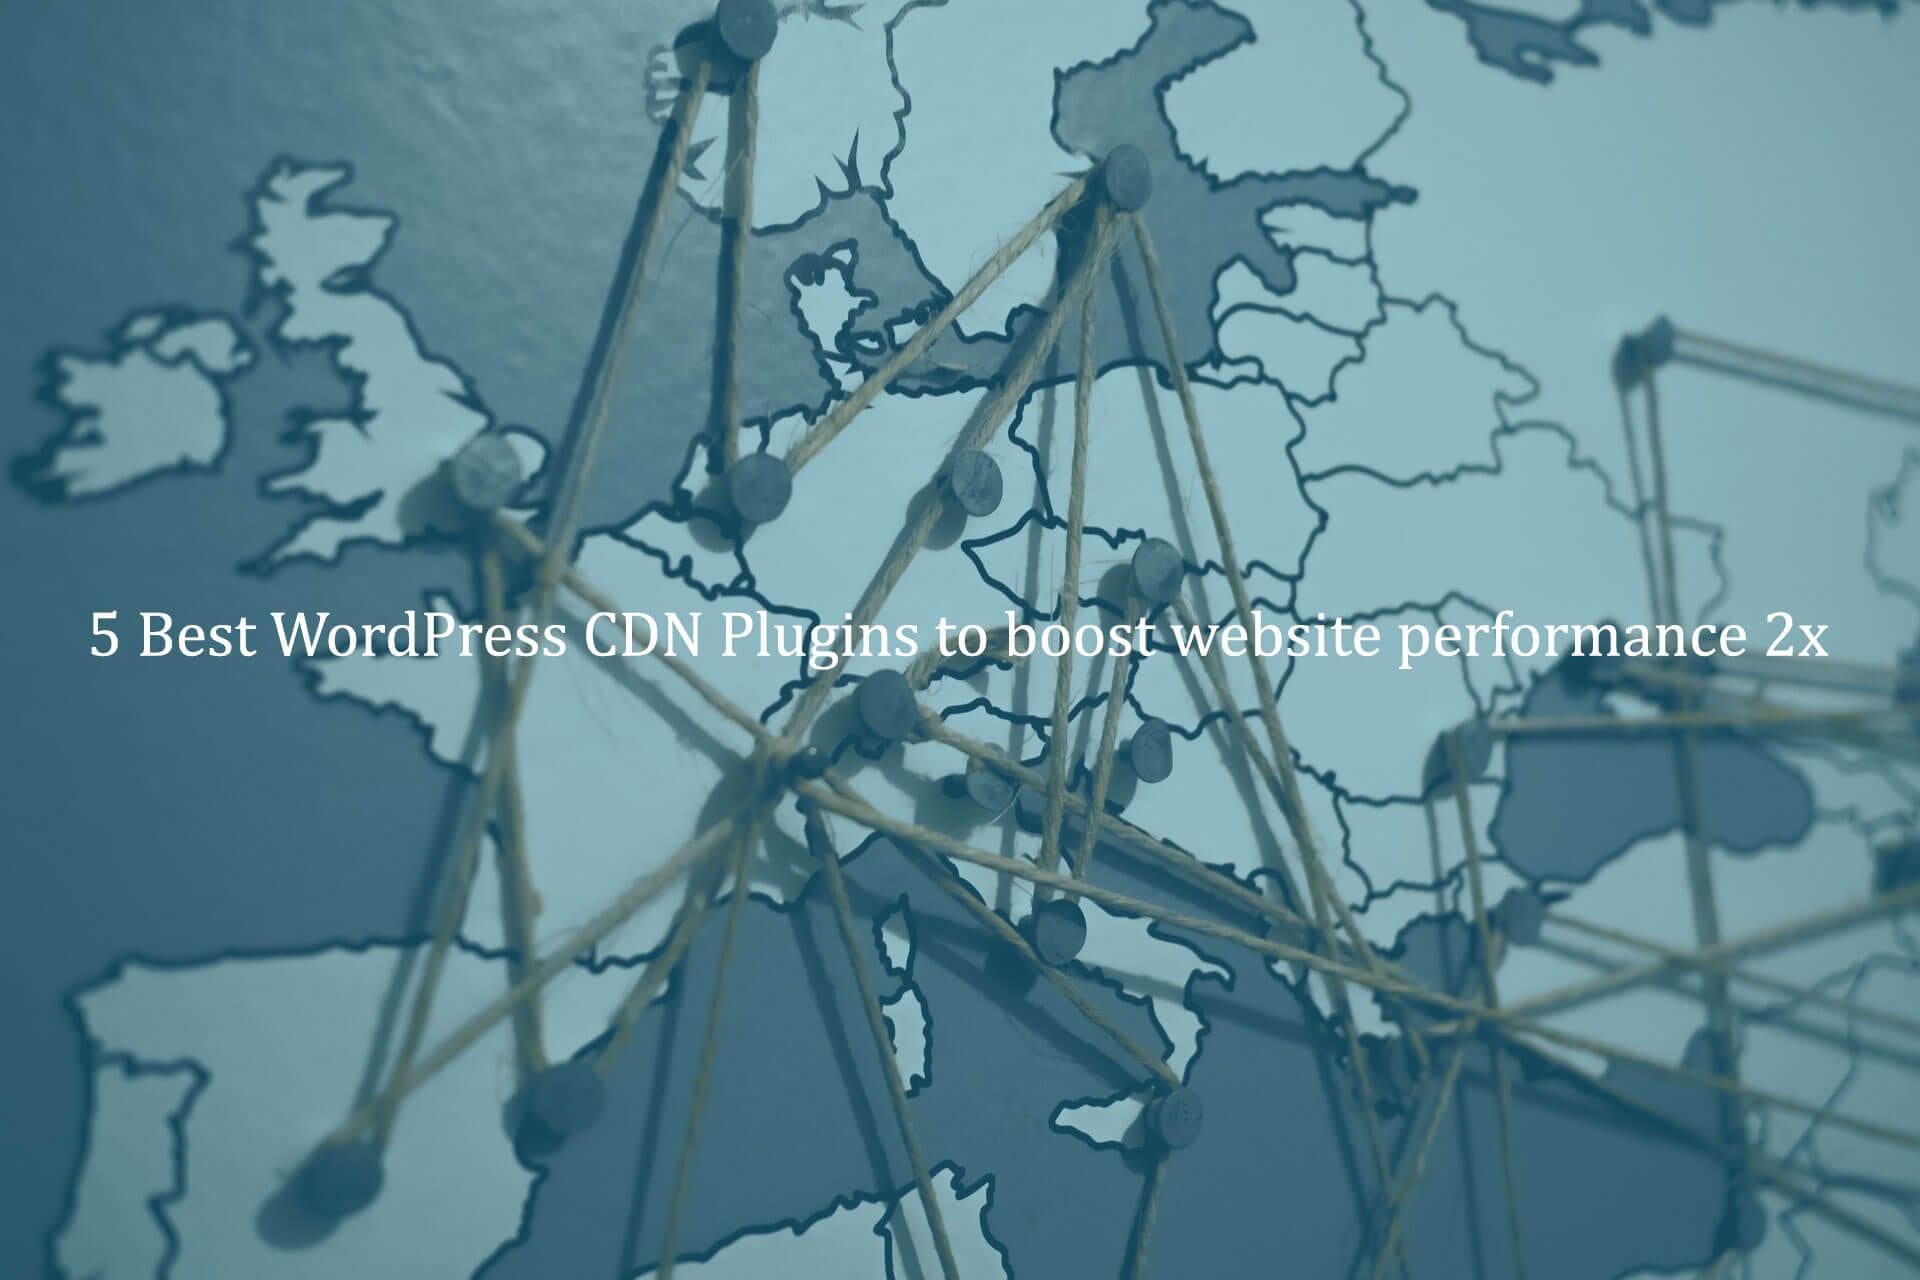 5-Best-WordPress-CDN-Plugins